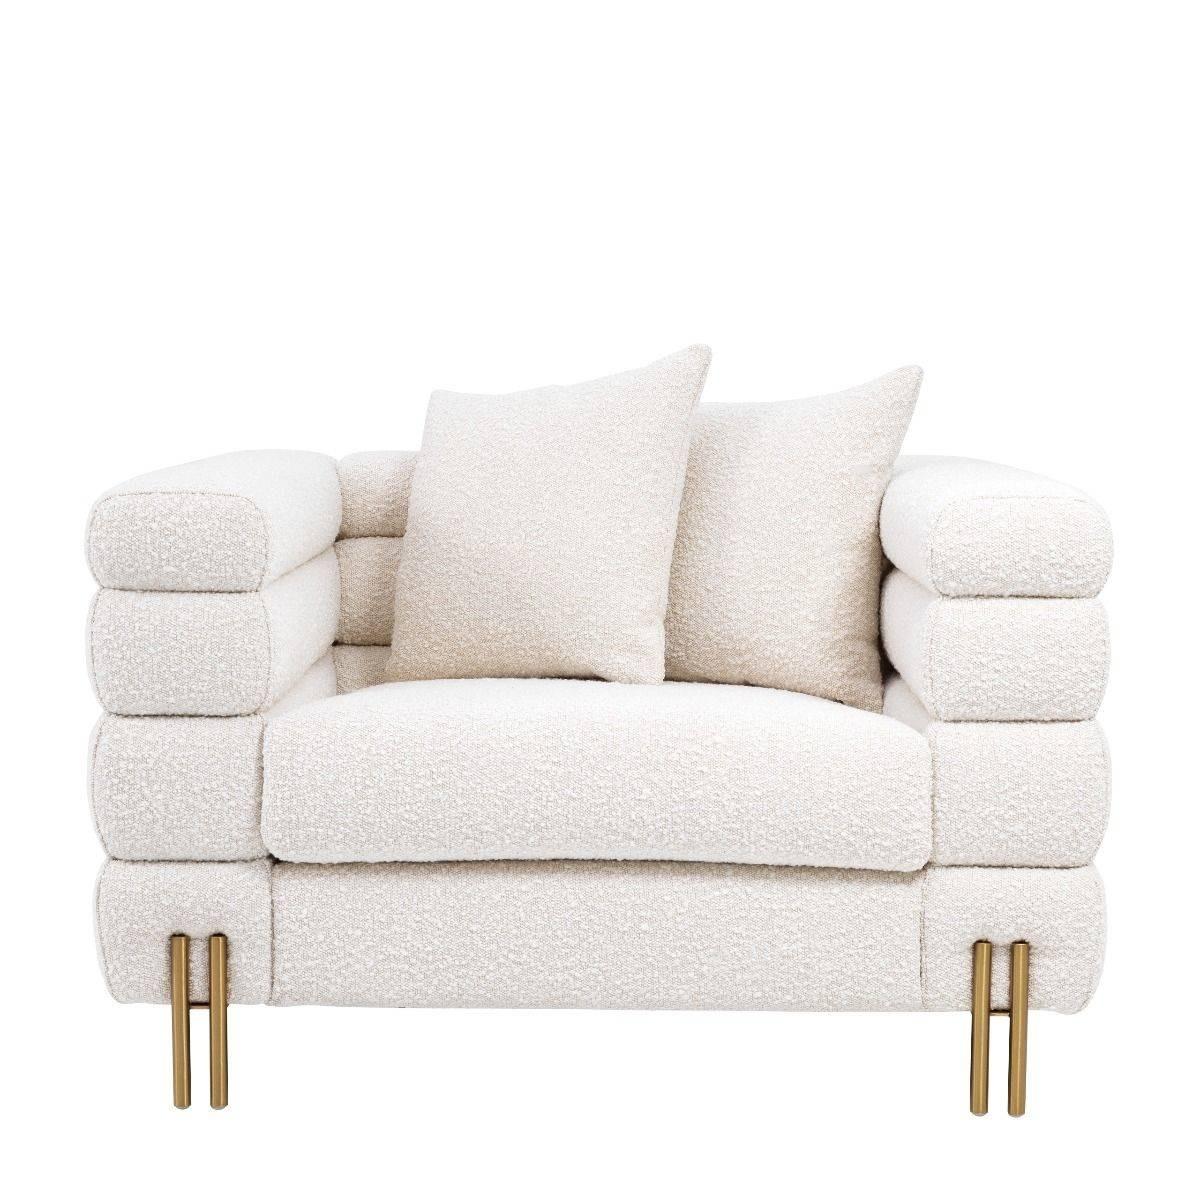 York Boucle Cream Armchair | SHOP NOW